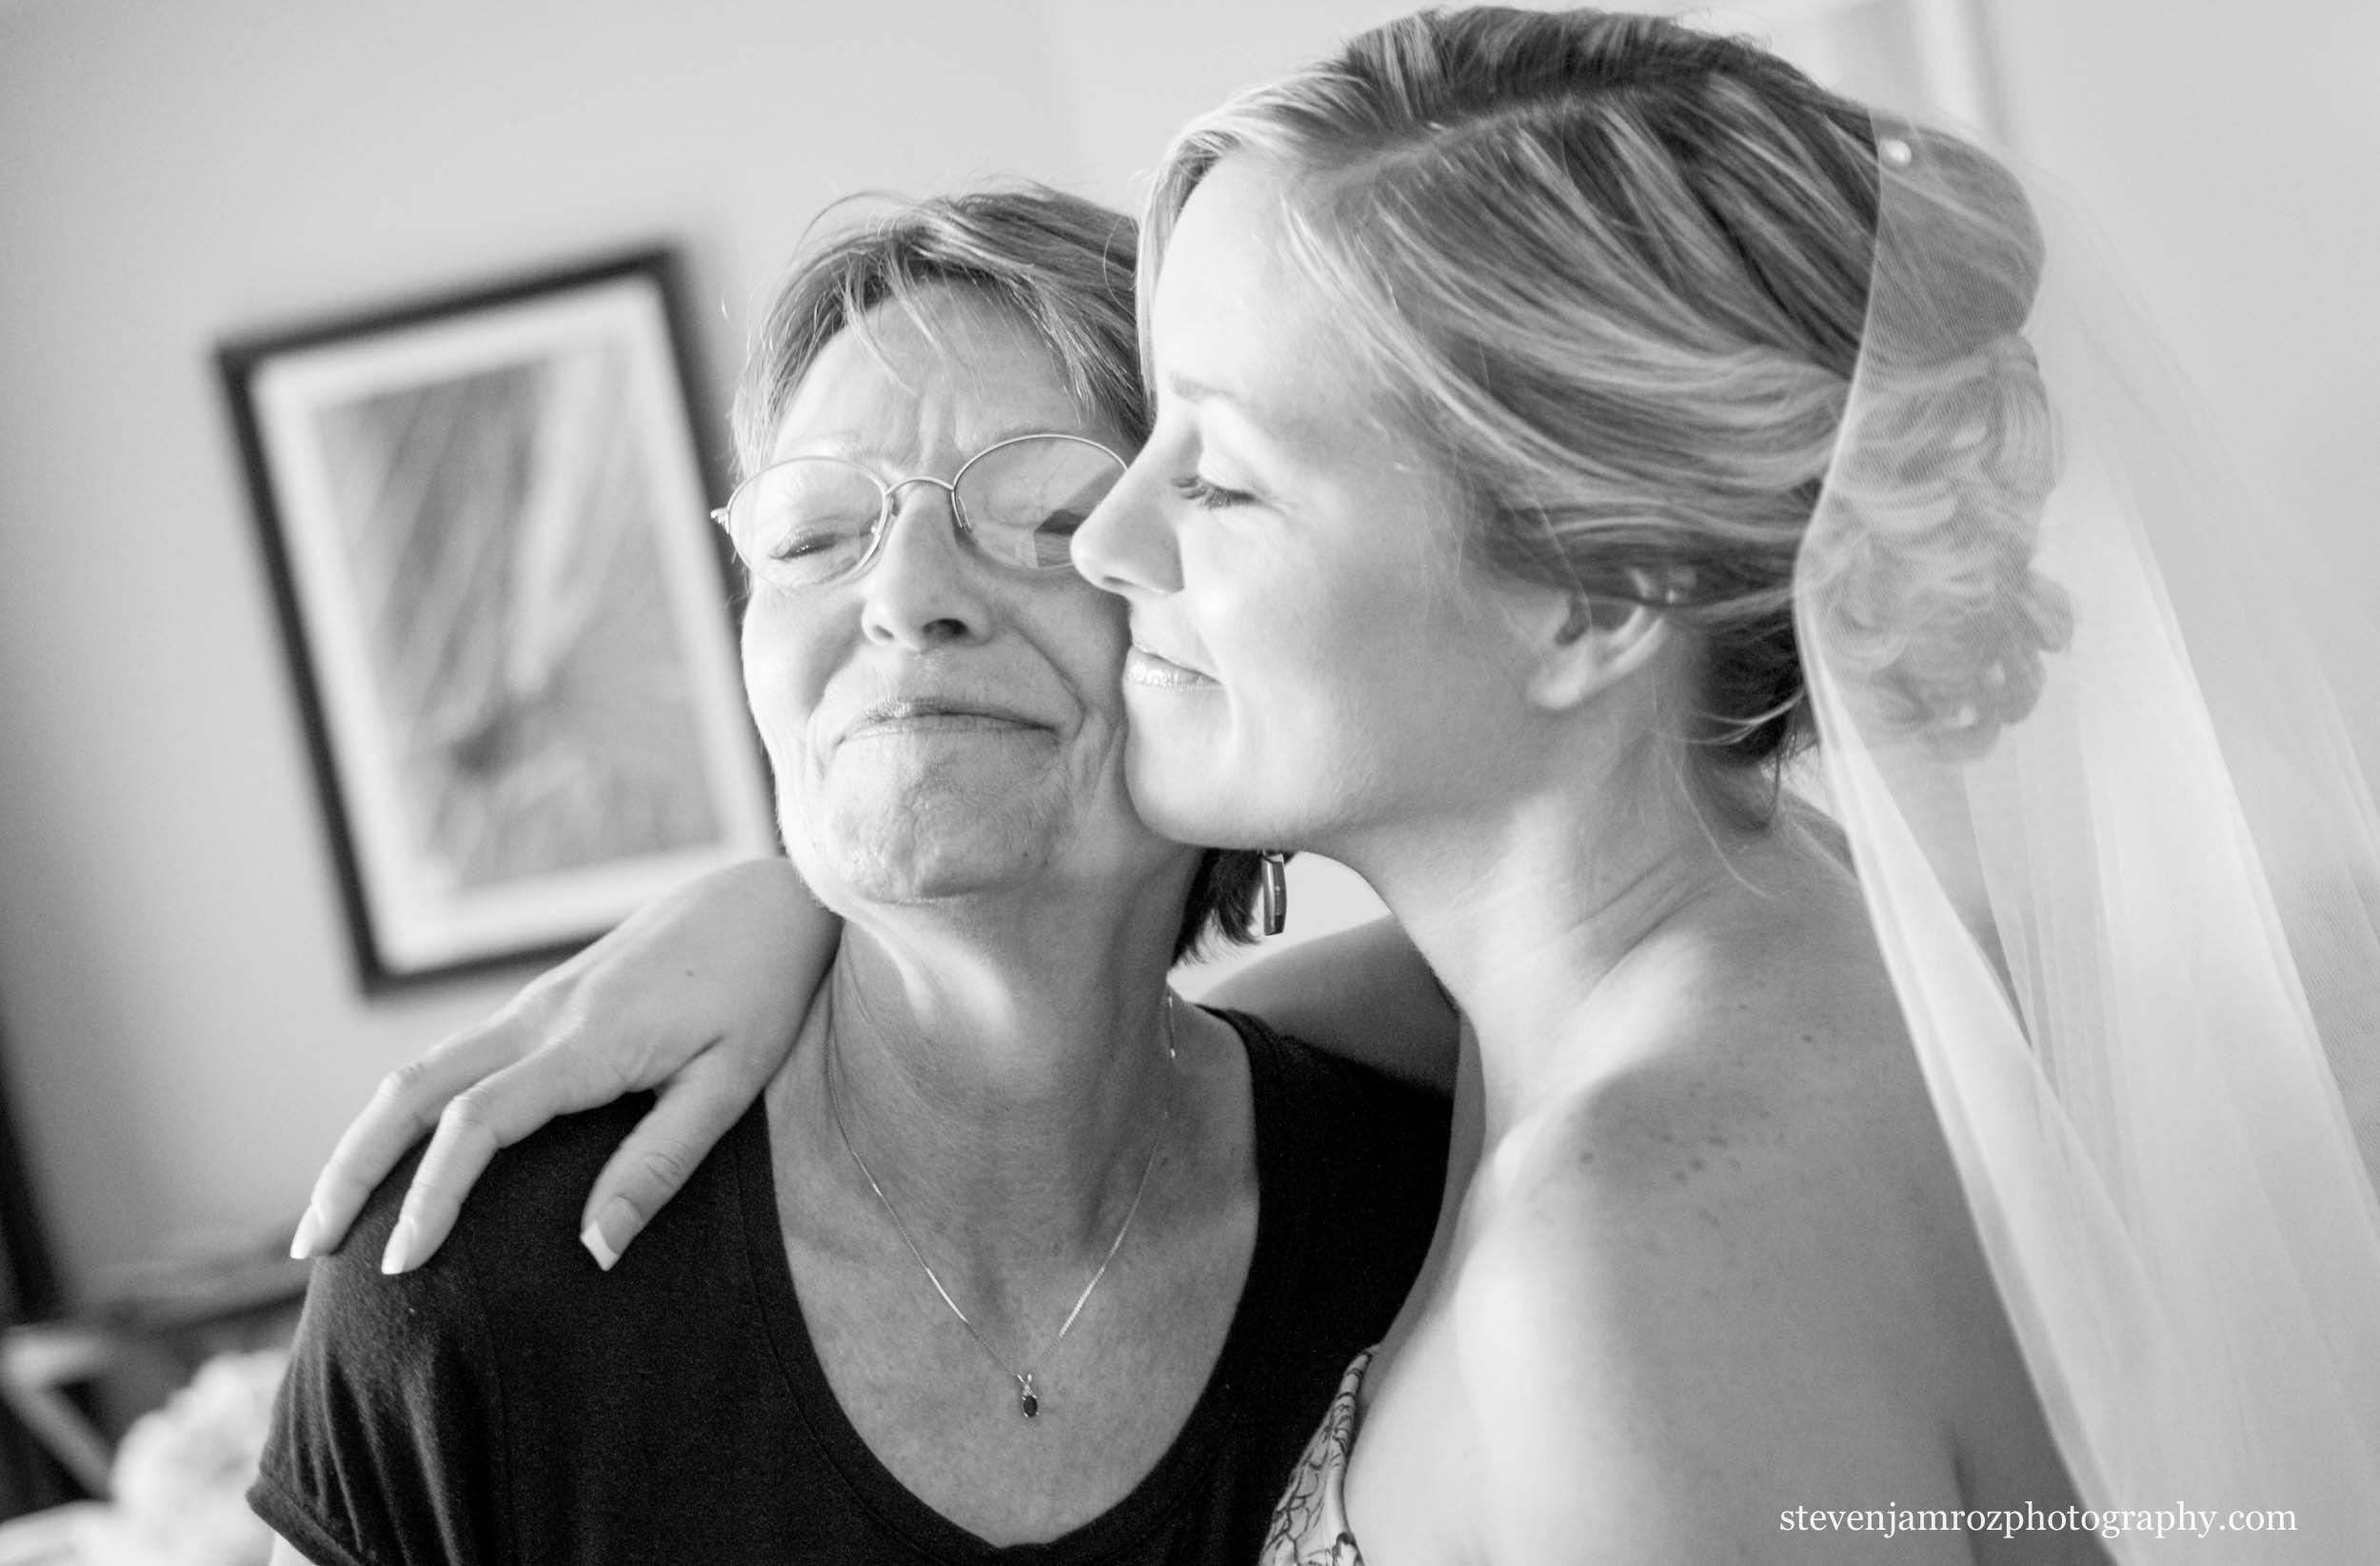 mom-hugs-bride-raleigh-nc-steven-jamroz-photography-0471.jpg